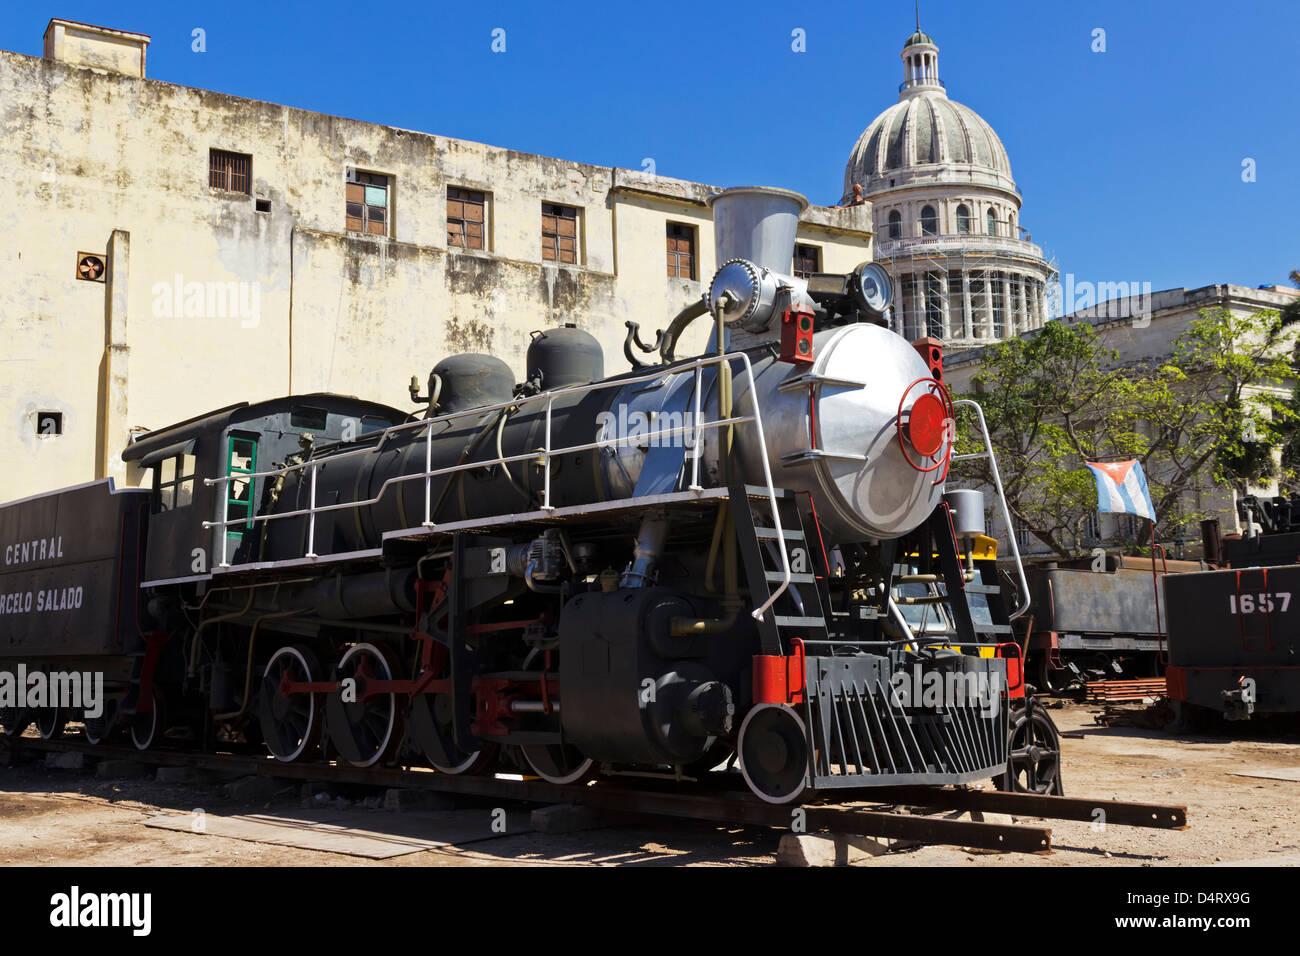 Old Locomotive being Repaired for Museum in Havana Cuba - Stock Image